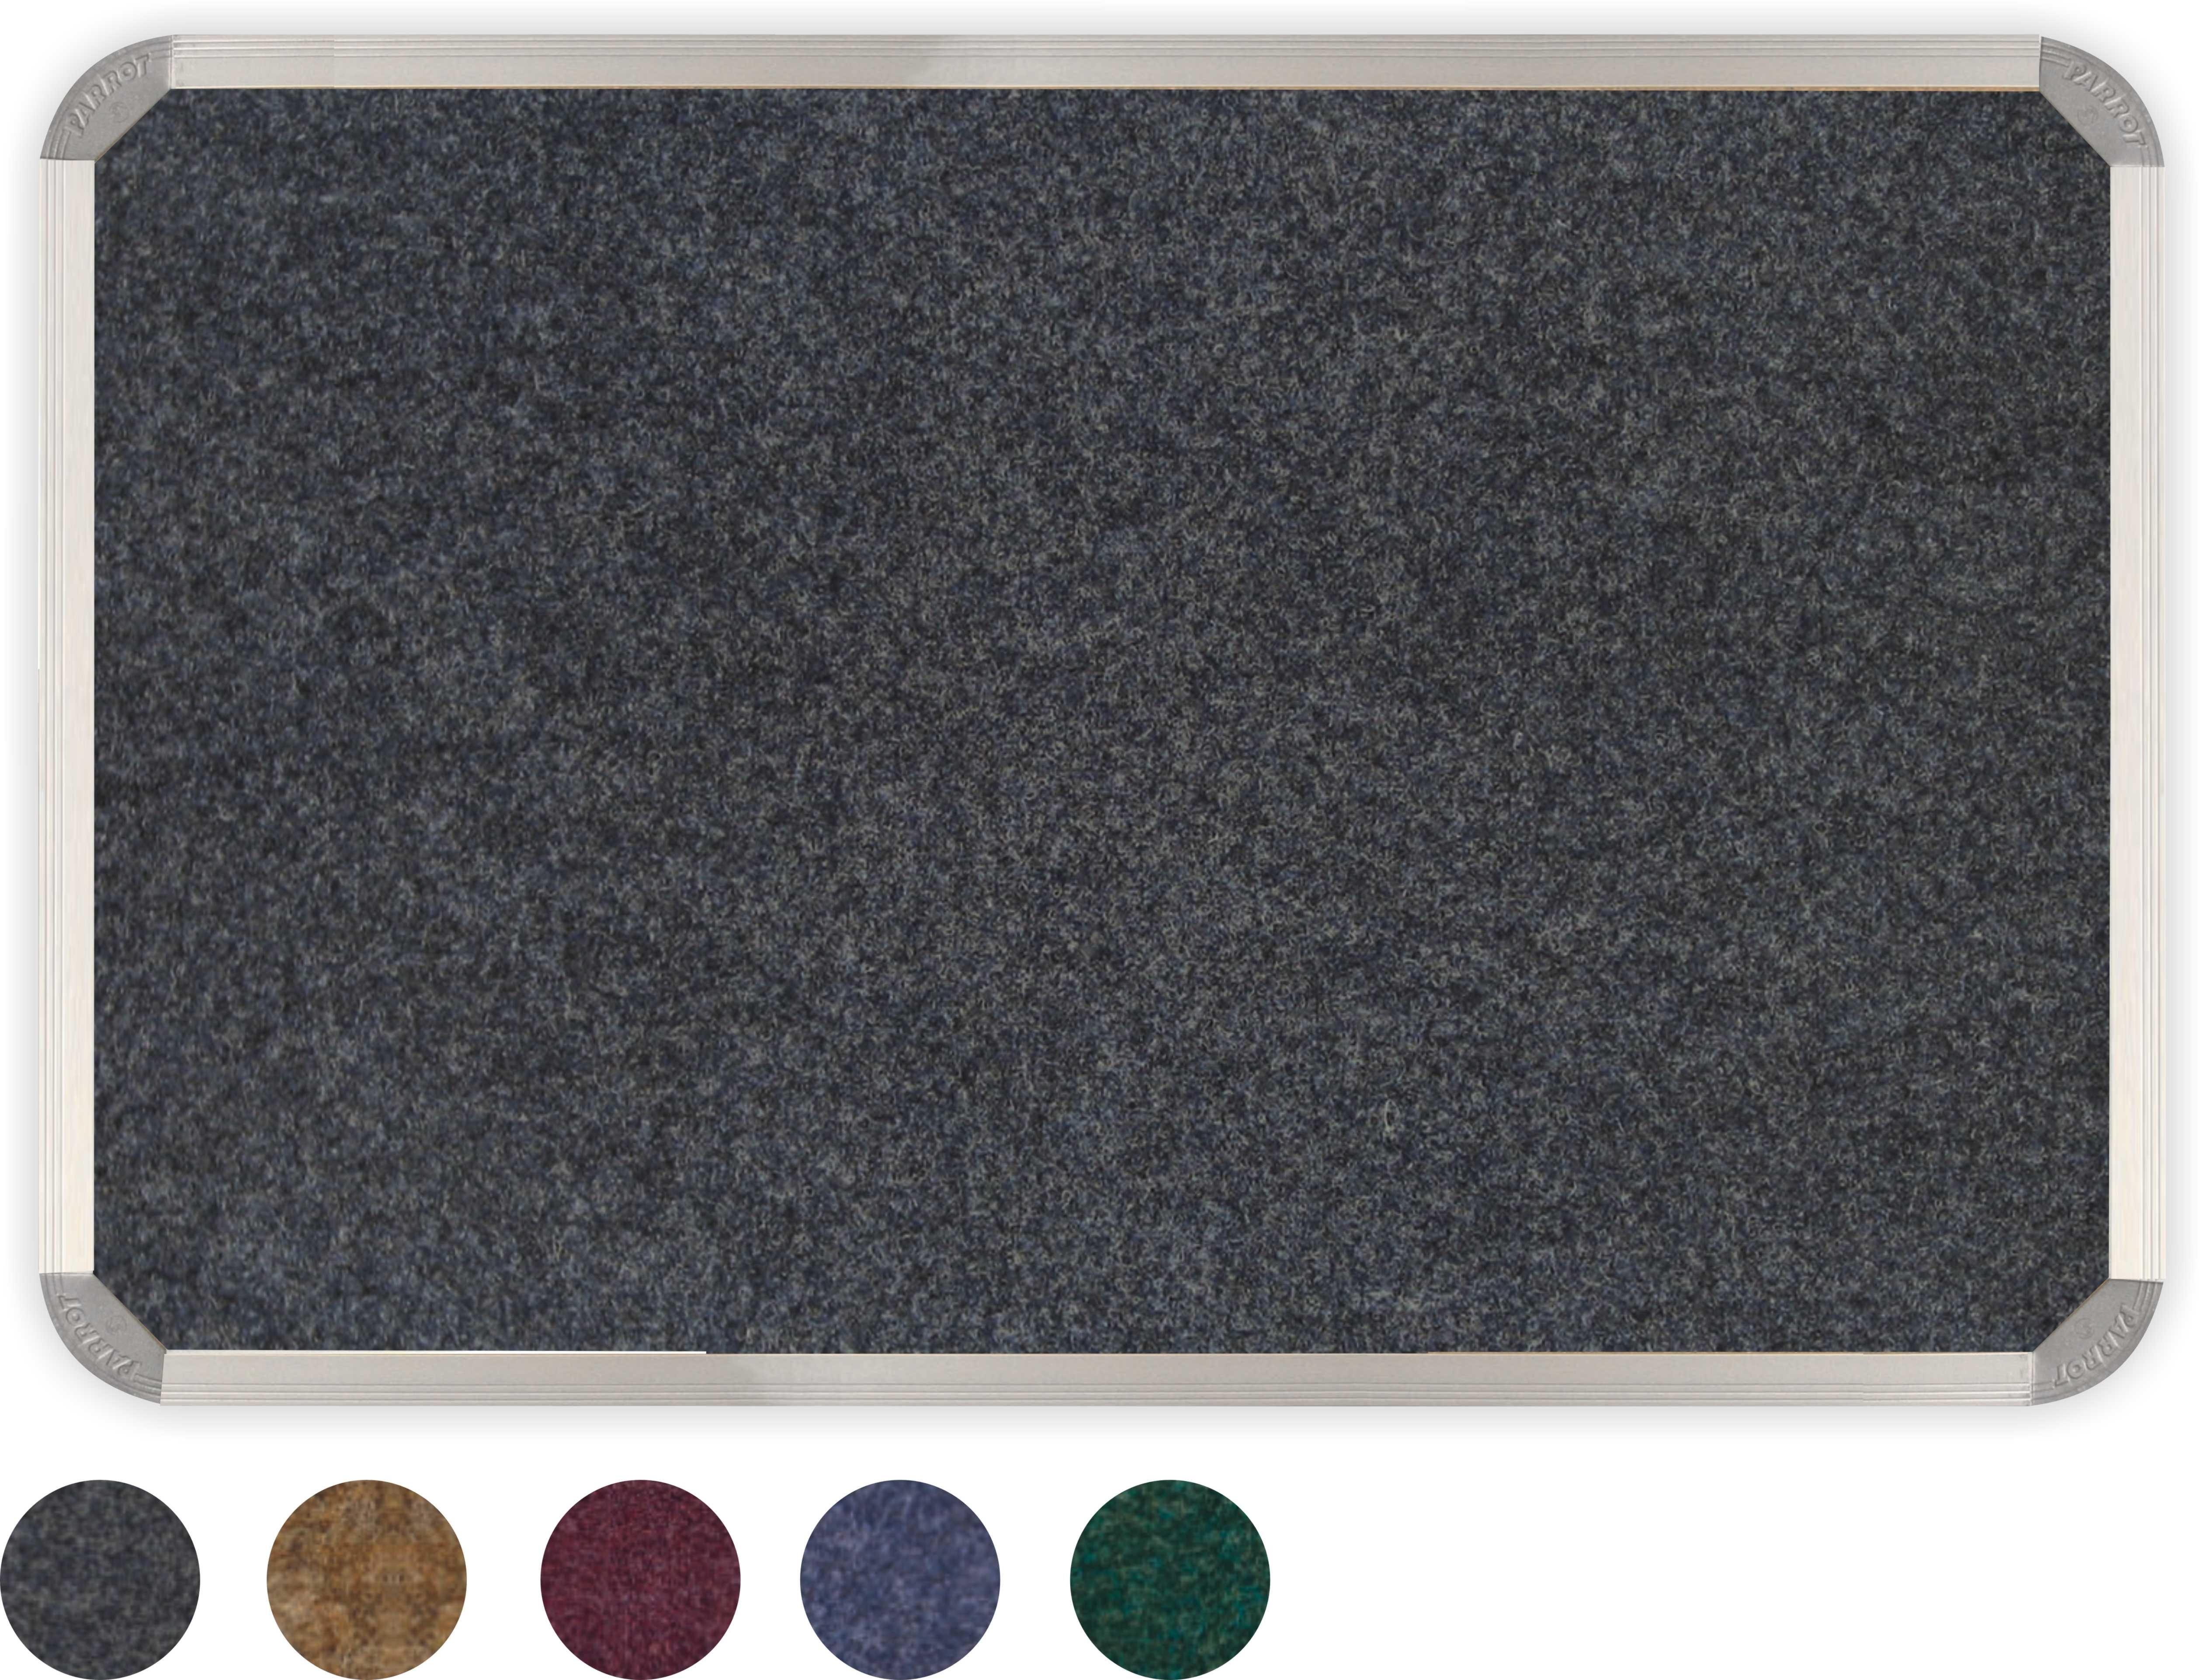 Parrot Bulletin Board Alum Frame 1500mmx1200mmmm Laurel